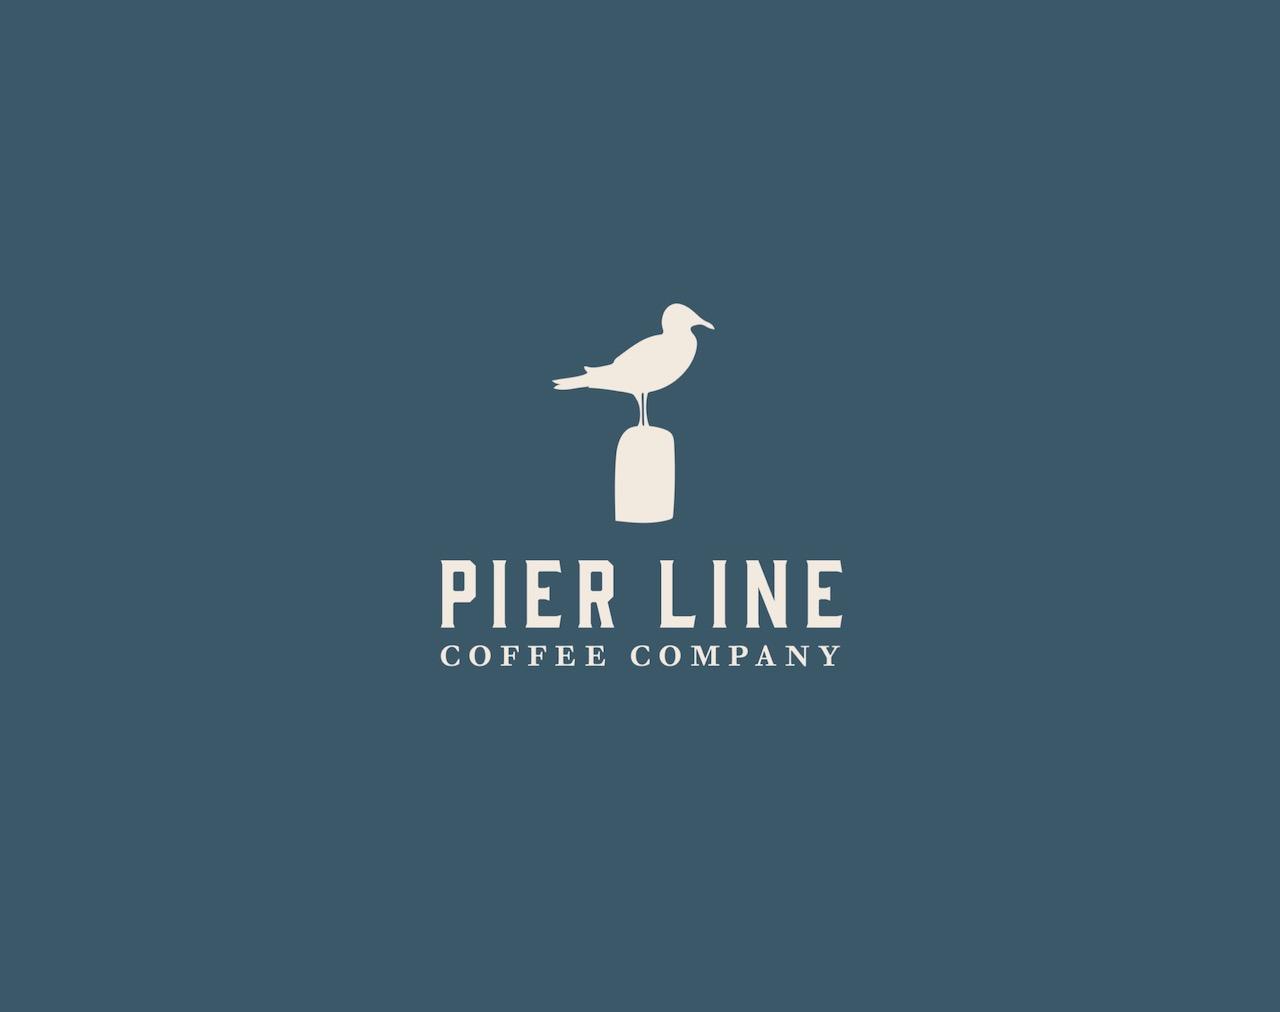 Pier Line Coffee Company image